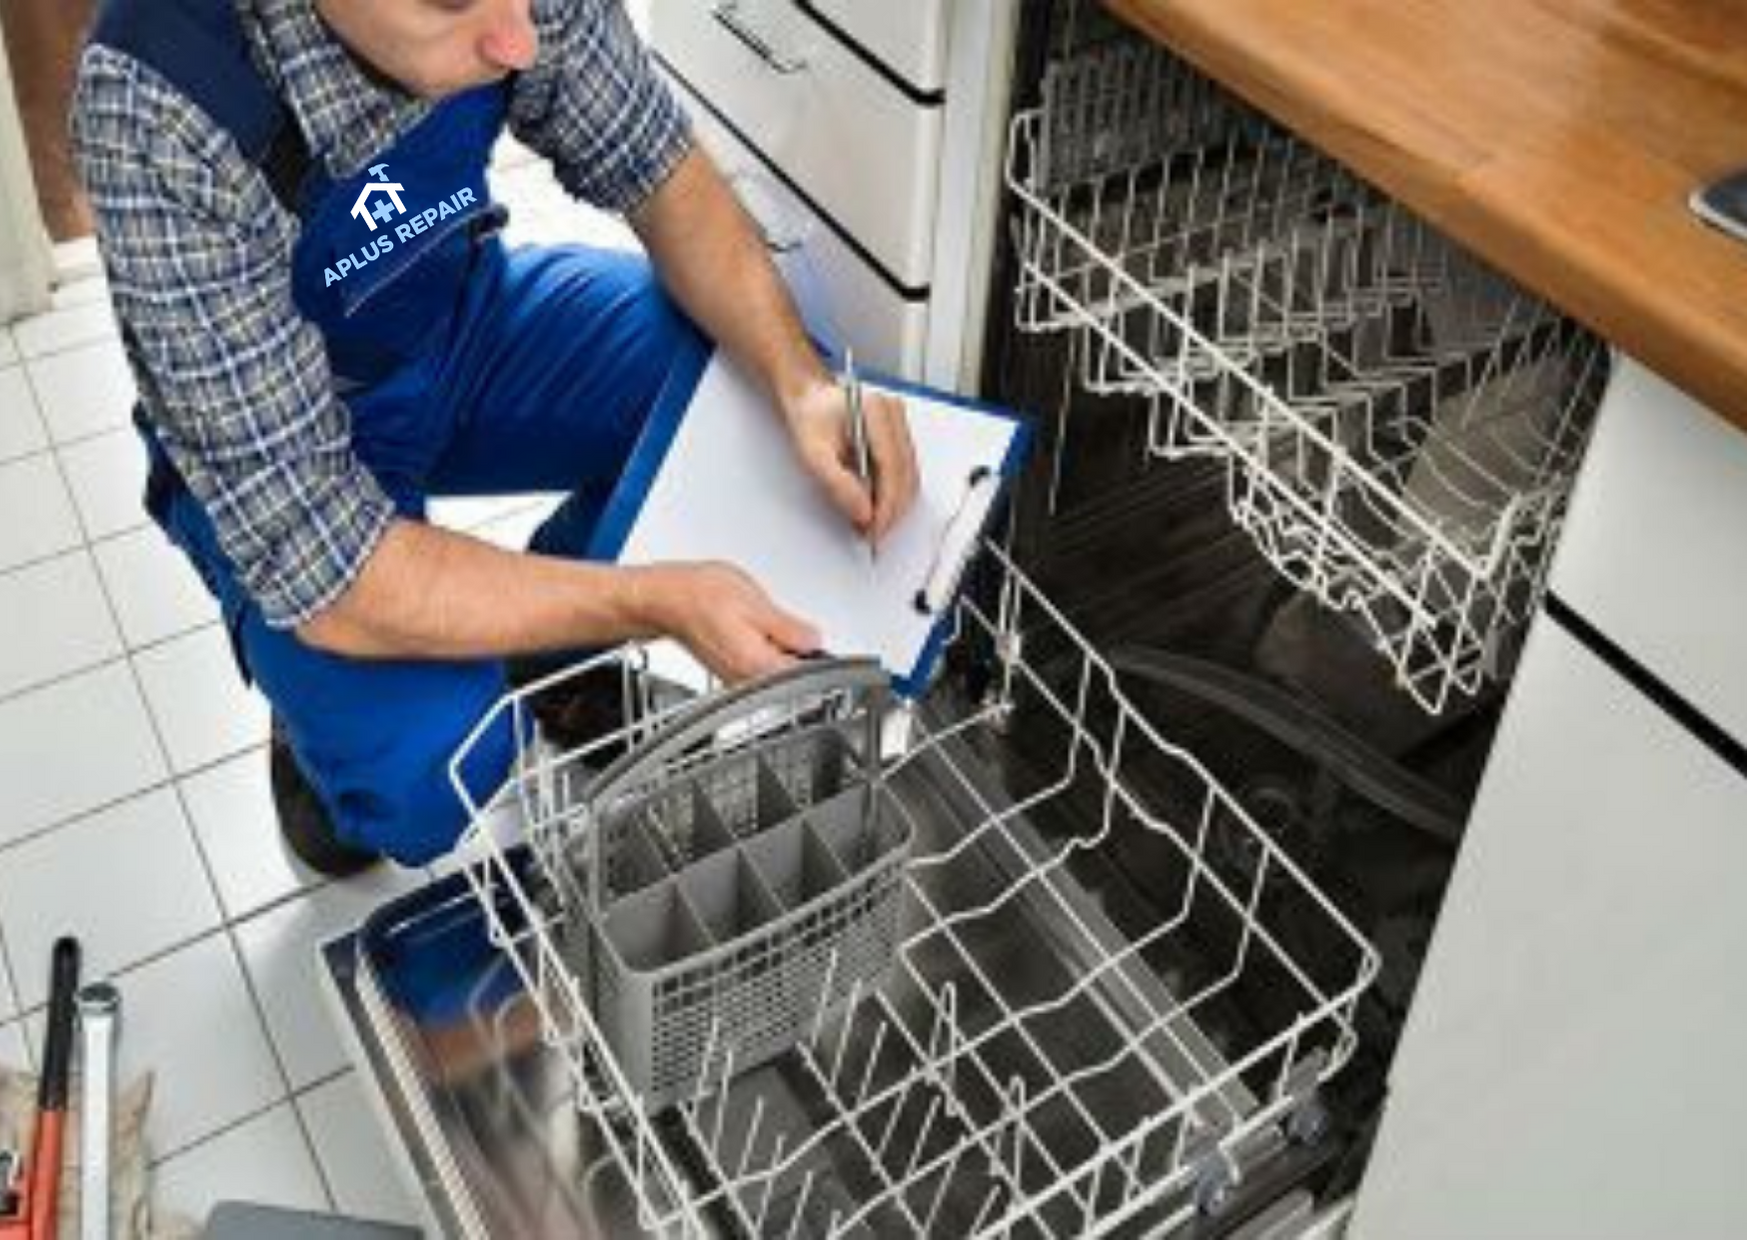 Dishwashers Repair Services Montreal Aplus Repair Repair Dishwasher Repair Cleaning Dishes